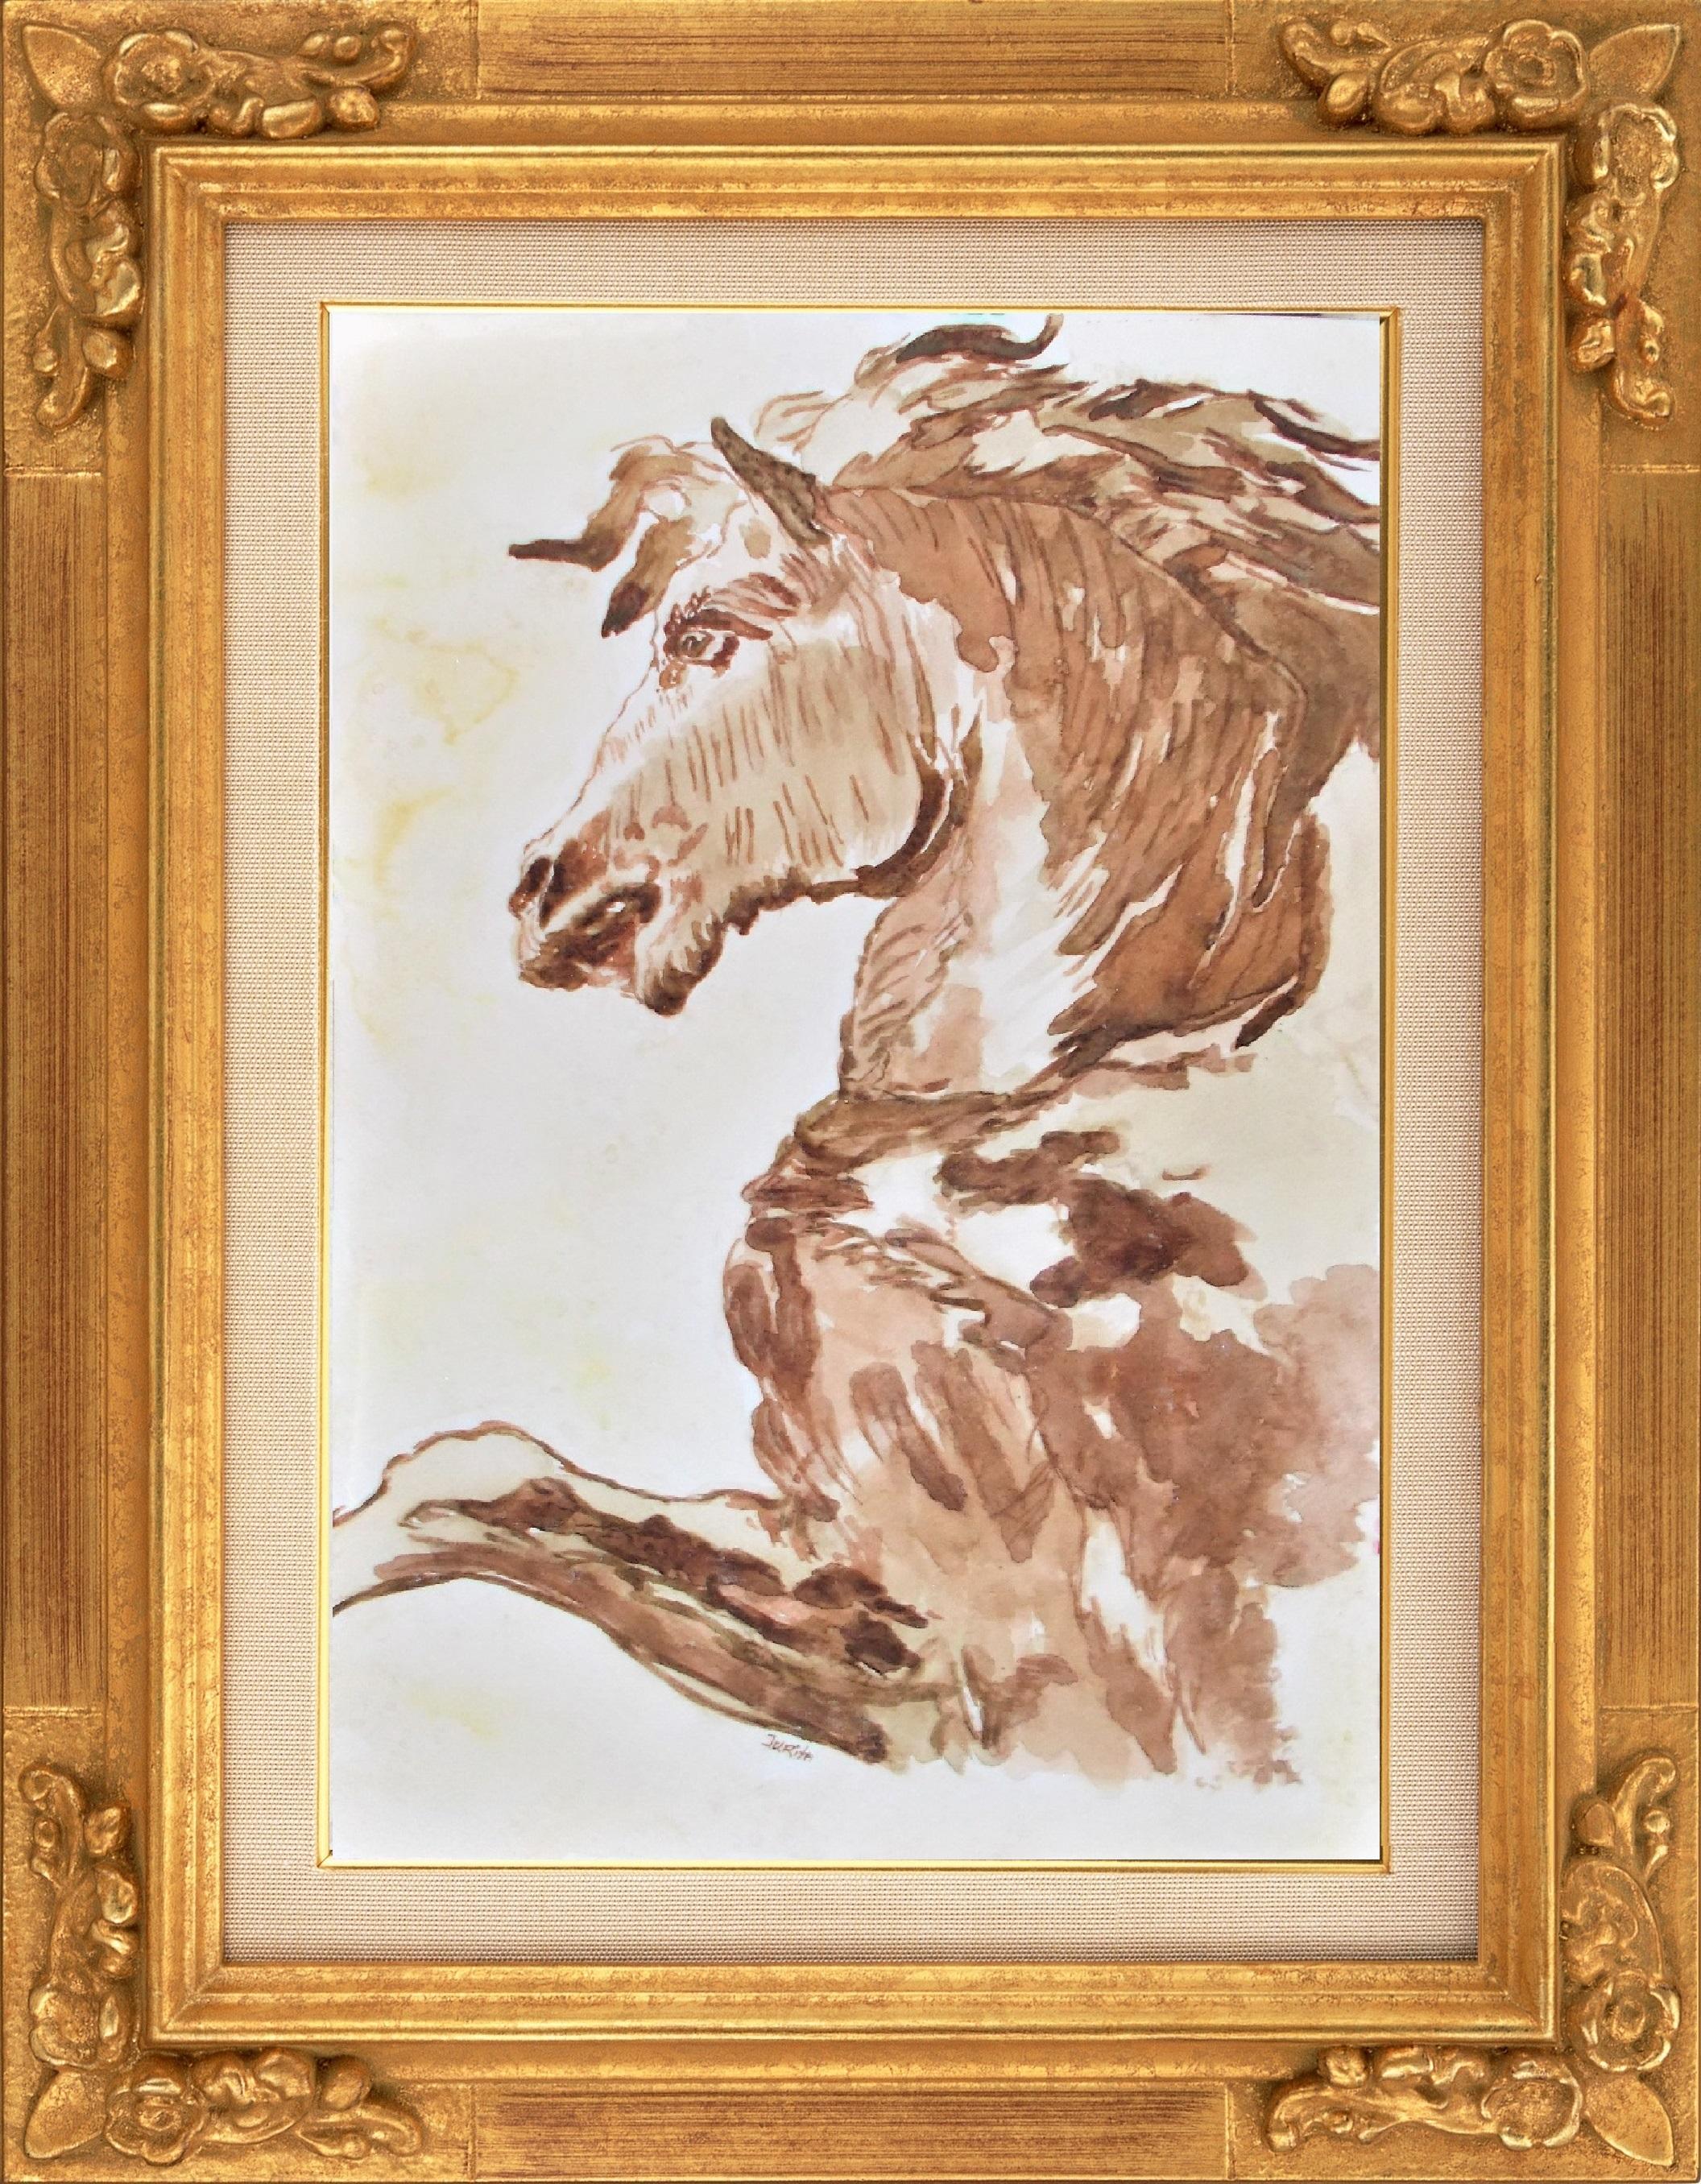 17 Horse in Profile_by Jurita Kalite (Kalitis)_watercolor © J Kalite 2017_www.LadyJuGallery.co.uk (4)